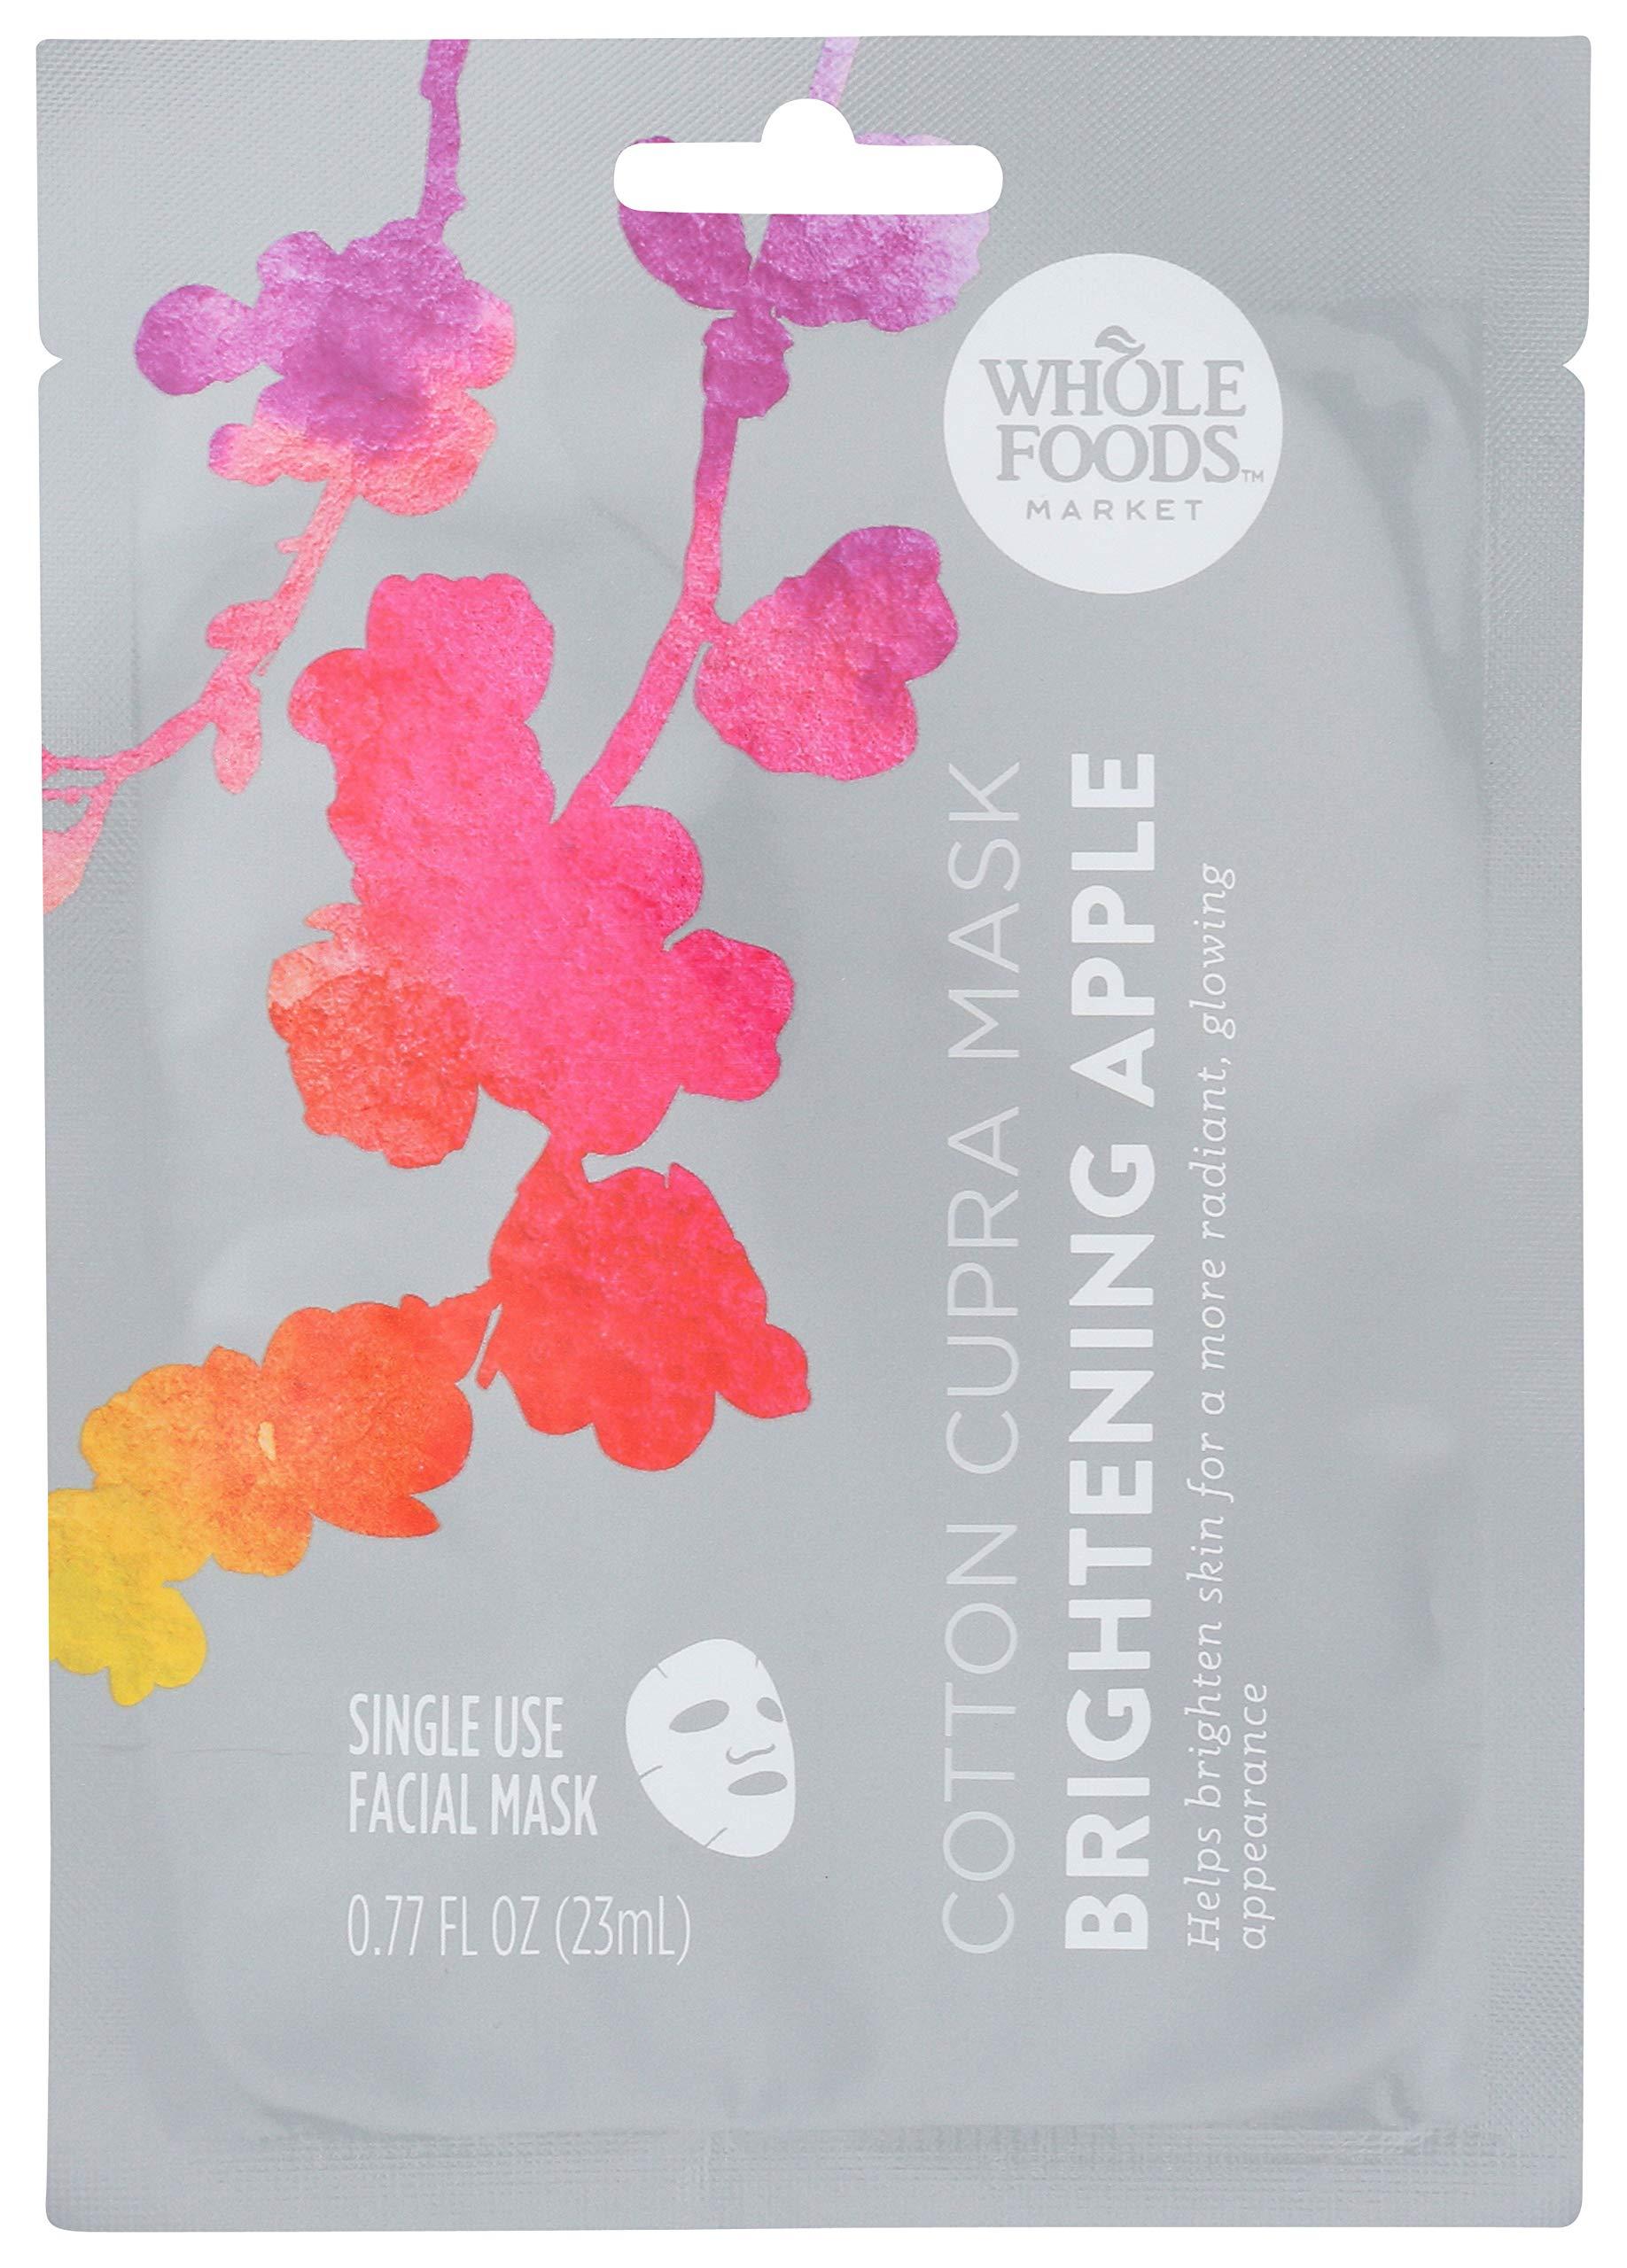 Whole Foods Market Cotton Cupra Mask, Brightening Apple, 0.77 fl oz